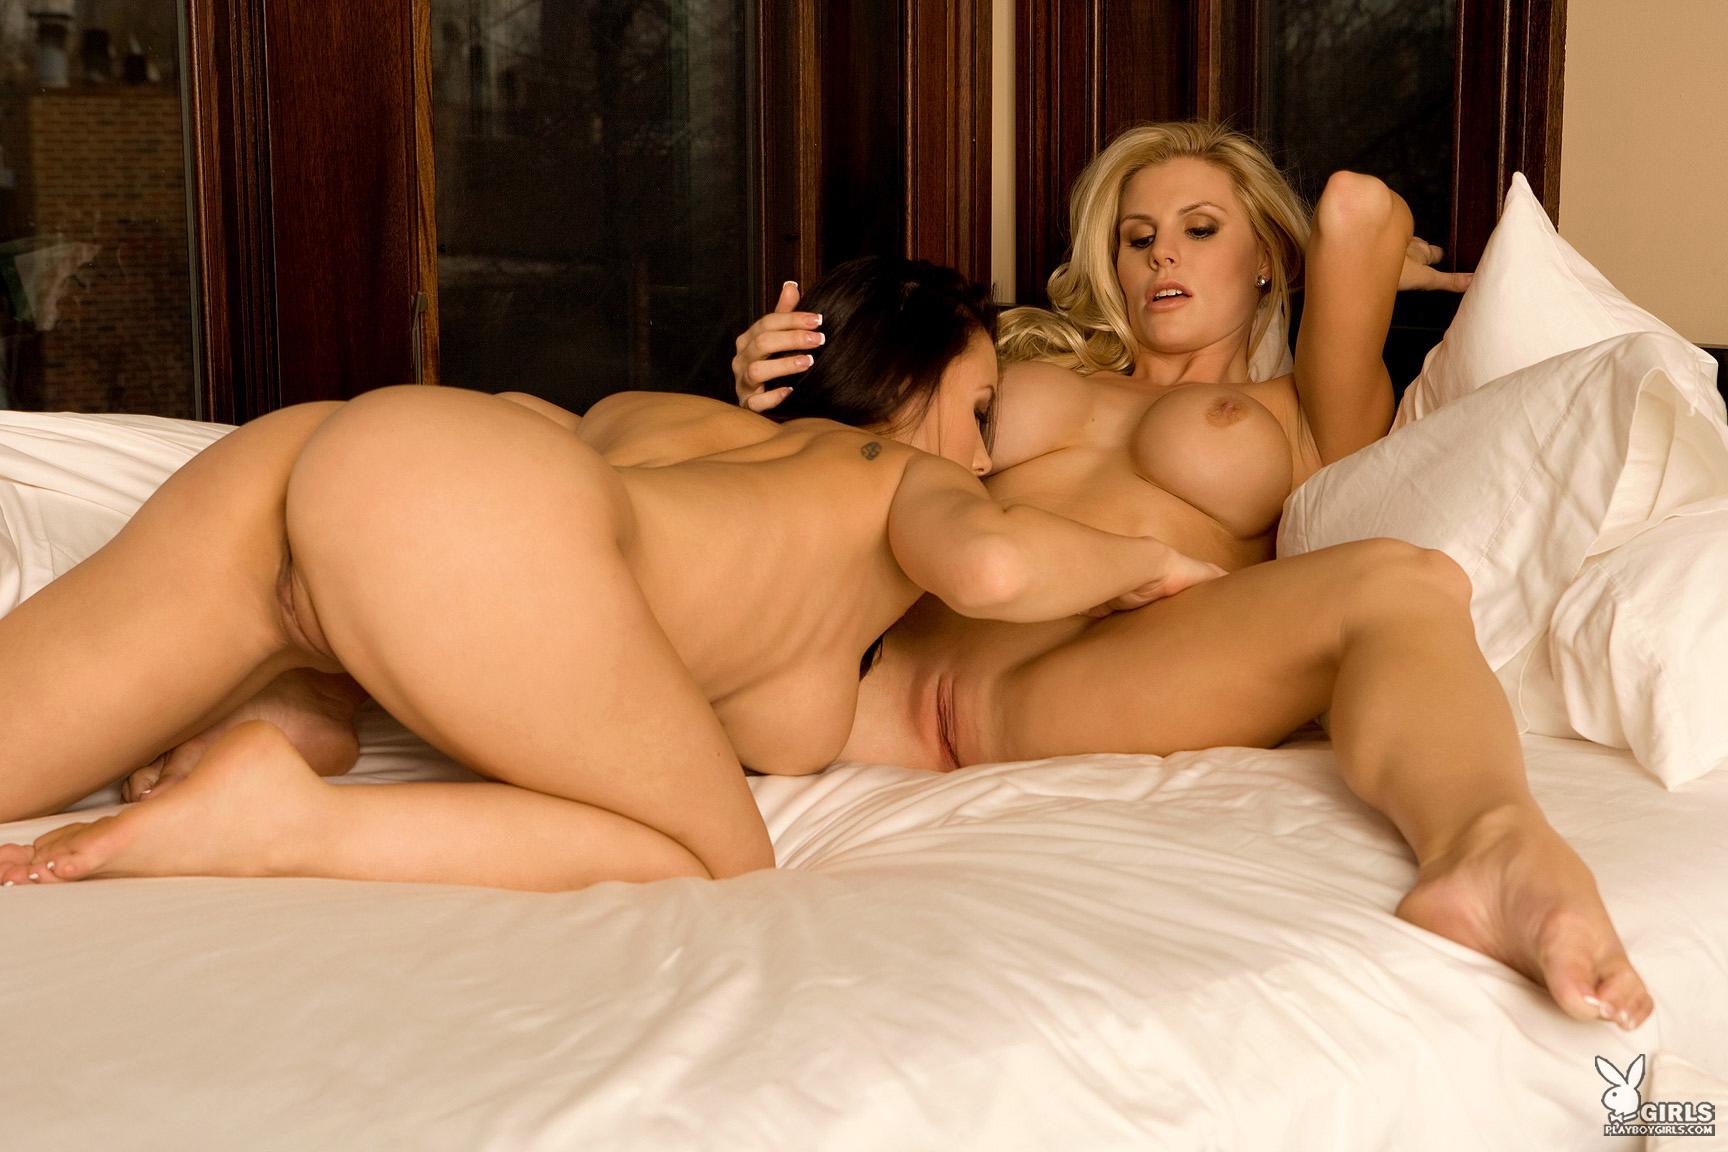 Секс красивая девушка секс брюнетка на кровати блондинка порно фото 11 фотография